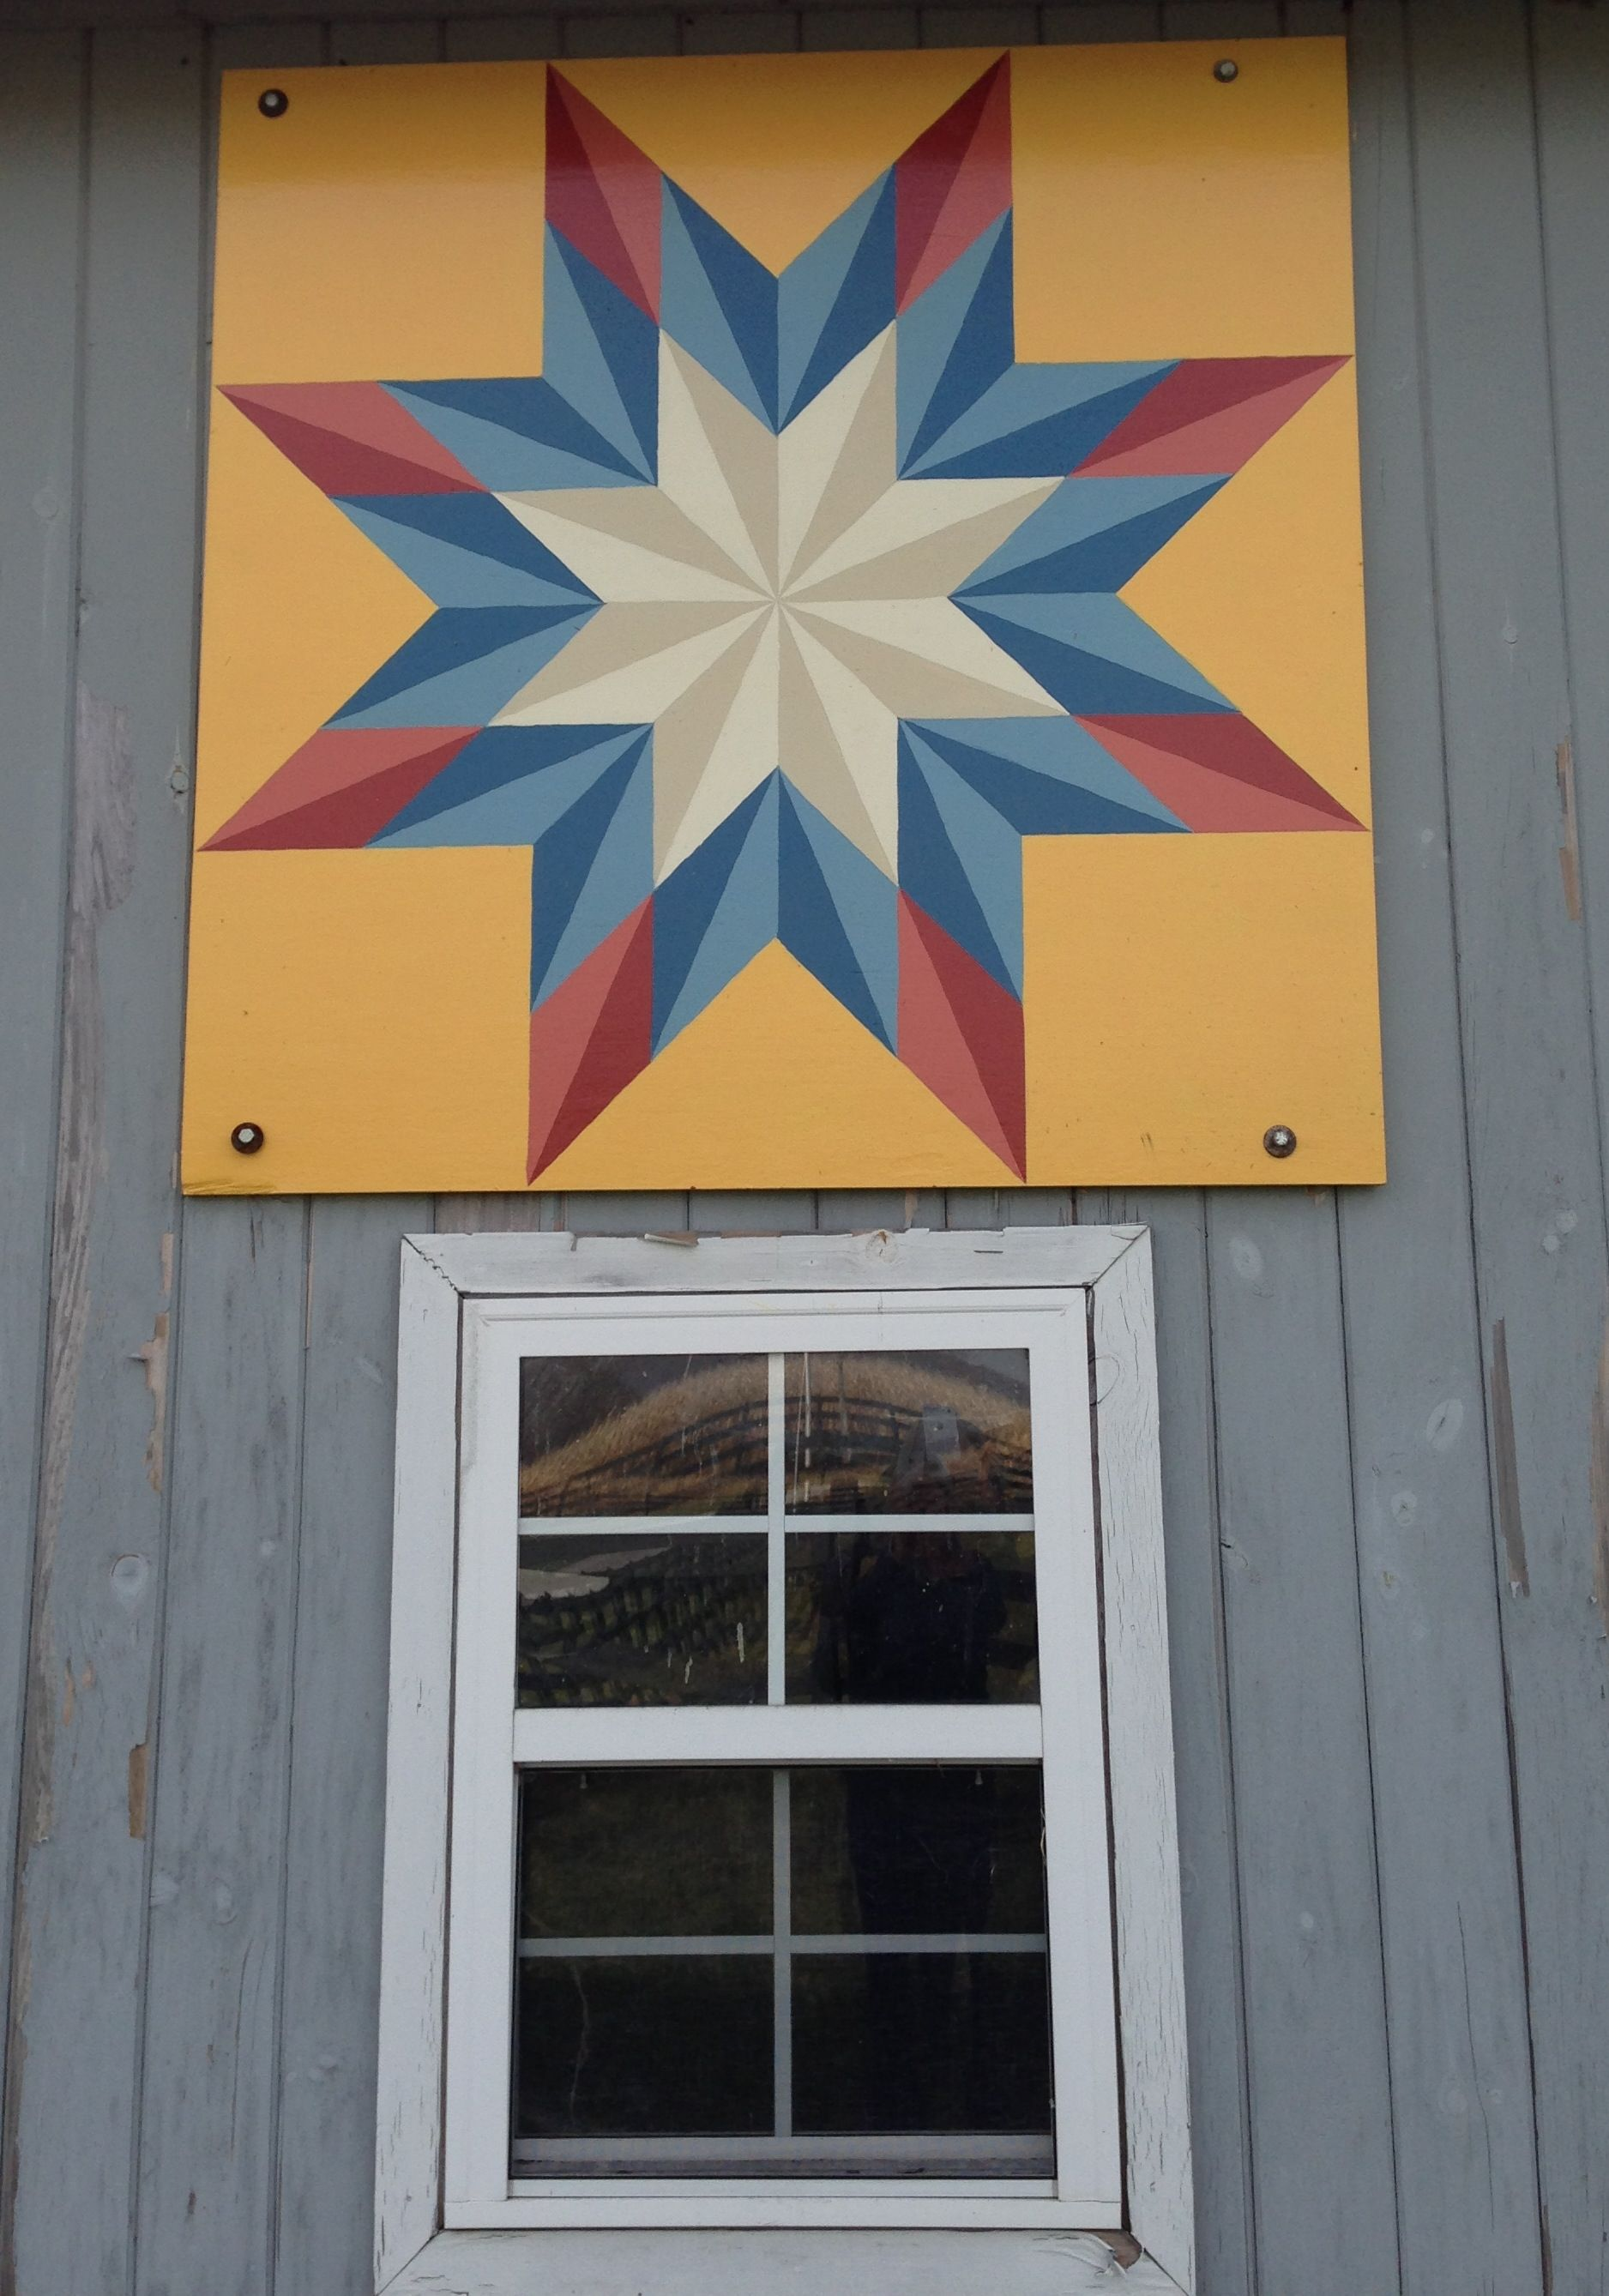 Quilt Patterns On Wisconsin Barns : Barn Quilt at High Point Farm Art Pinterest